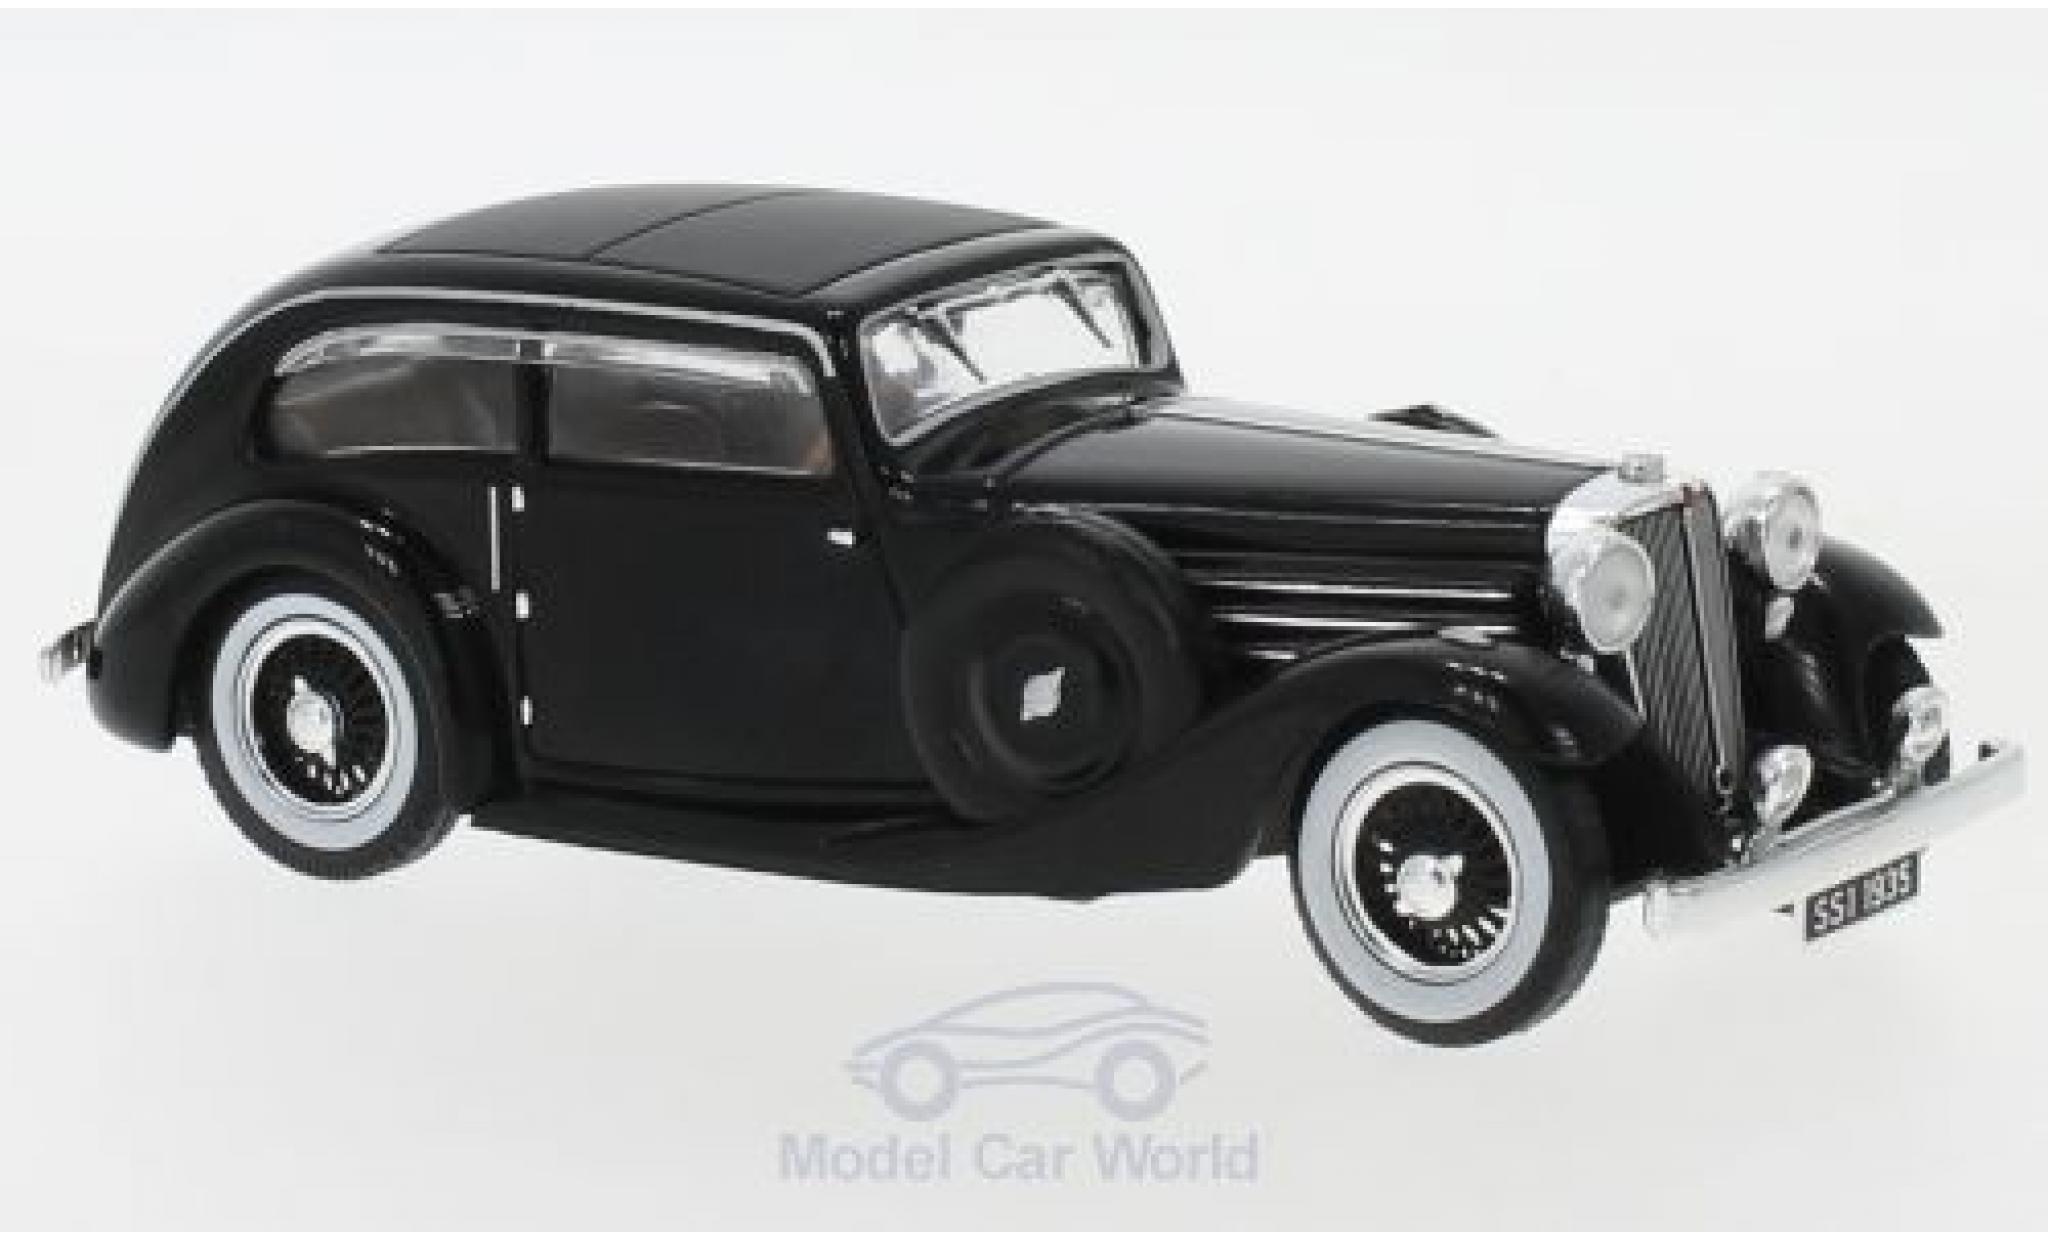 Jaguar SS 1/43 IXO 1 Airline Coupe black RHD 1935